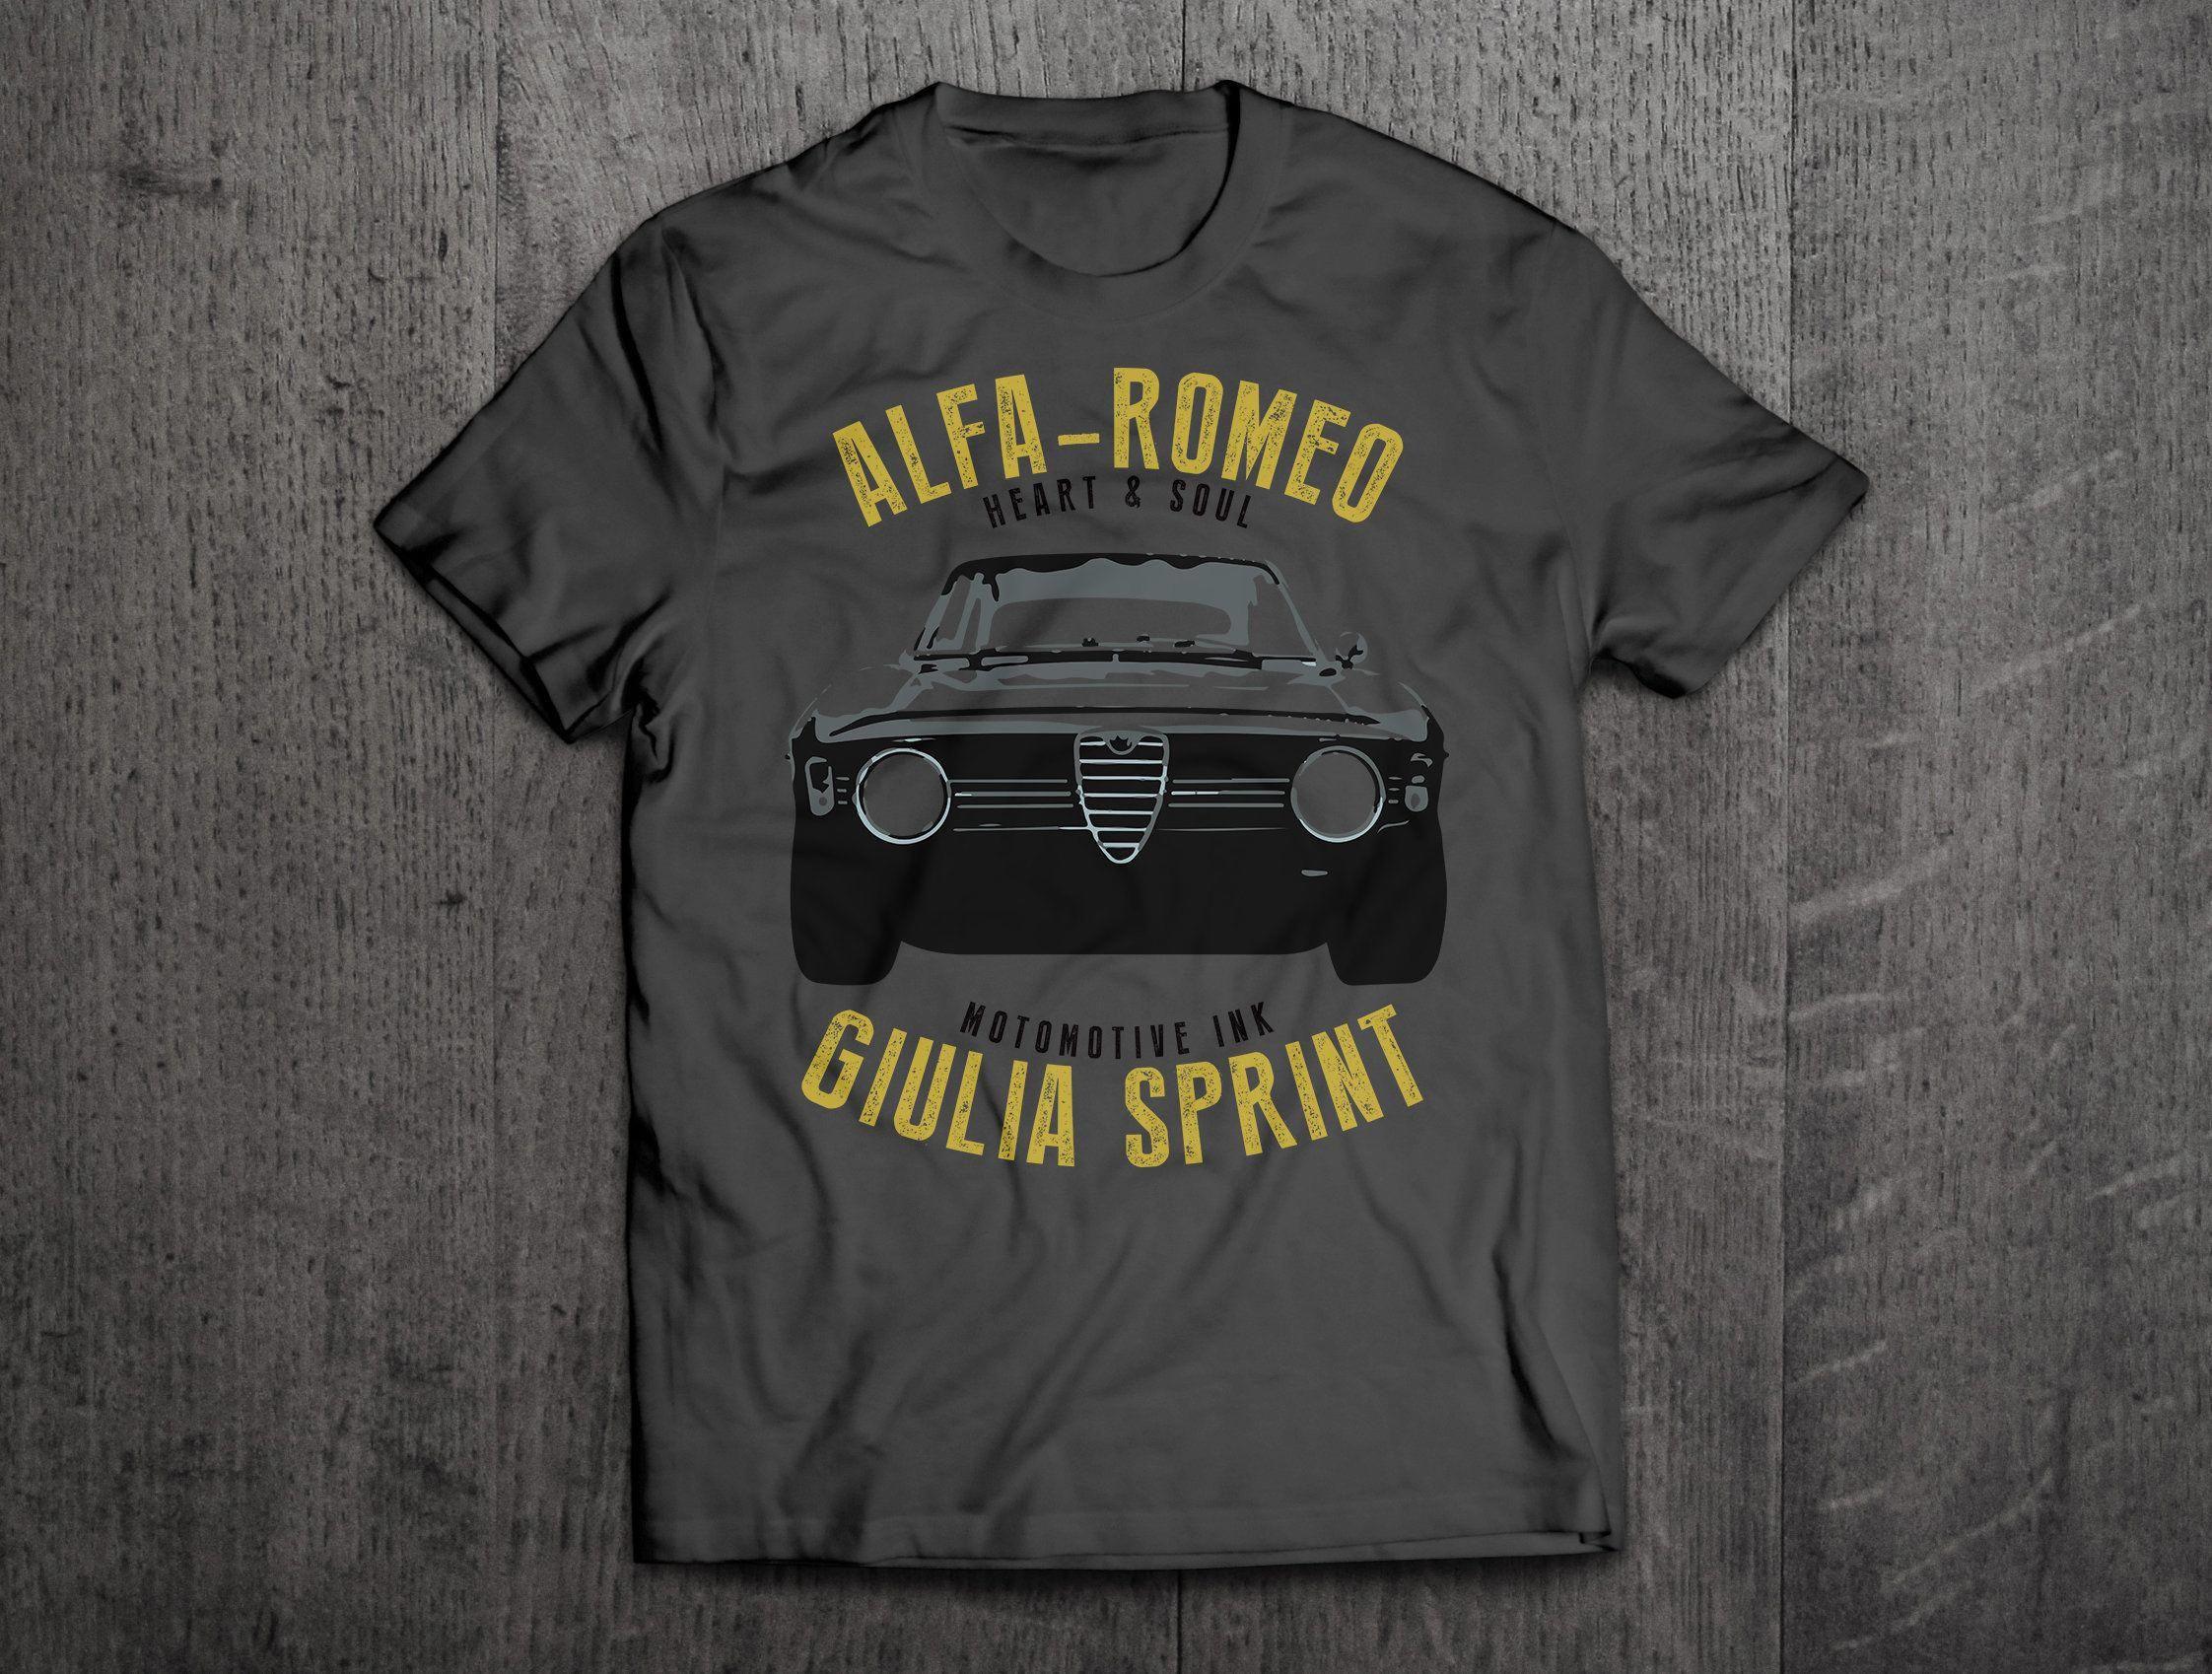 cb7079397c4 Alfa Romeo Giulia Sprint shirts